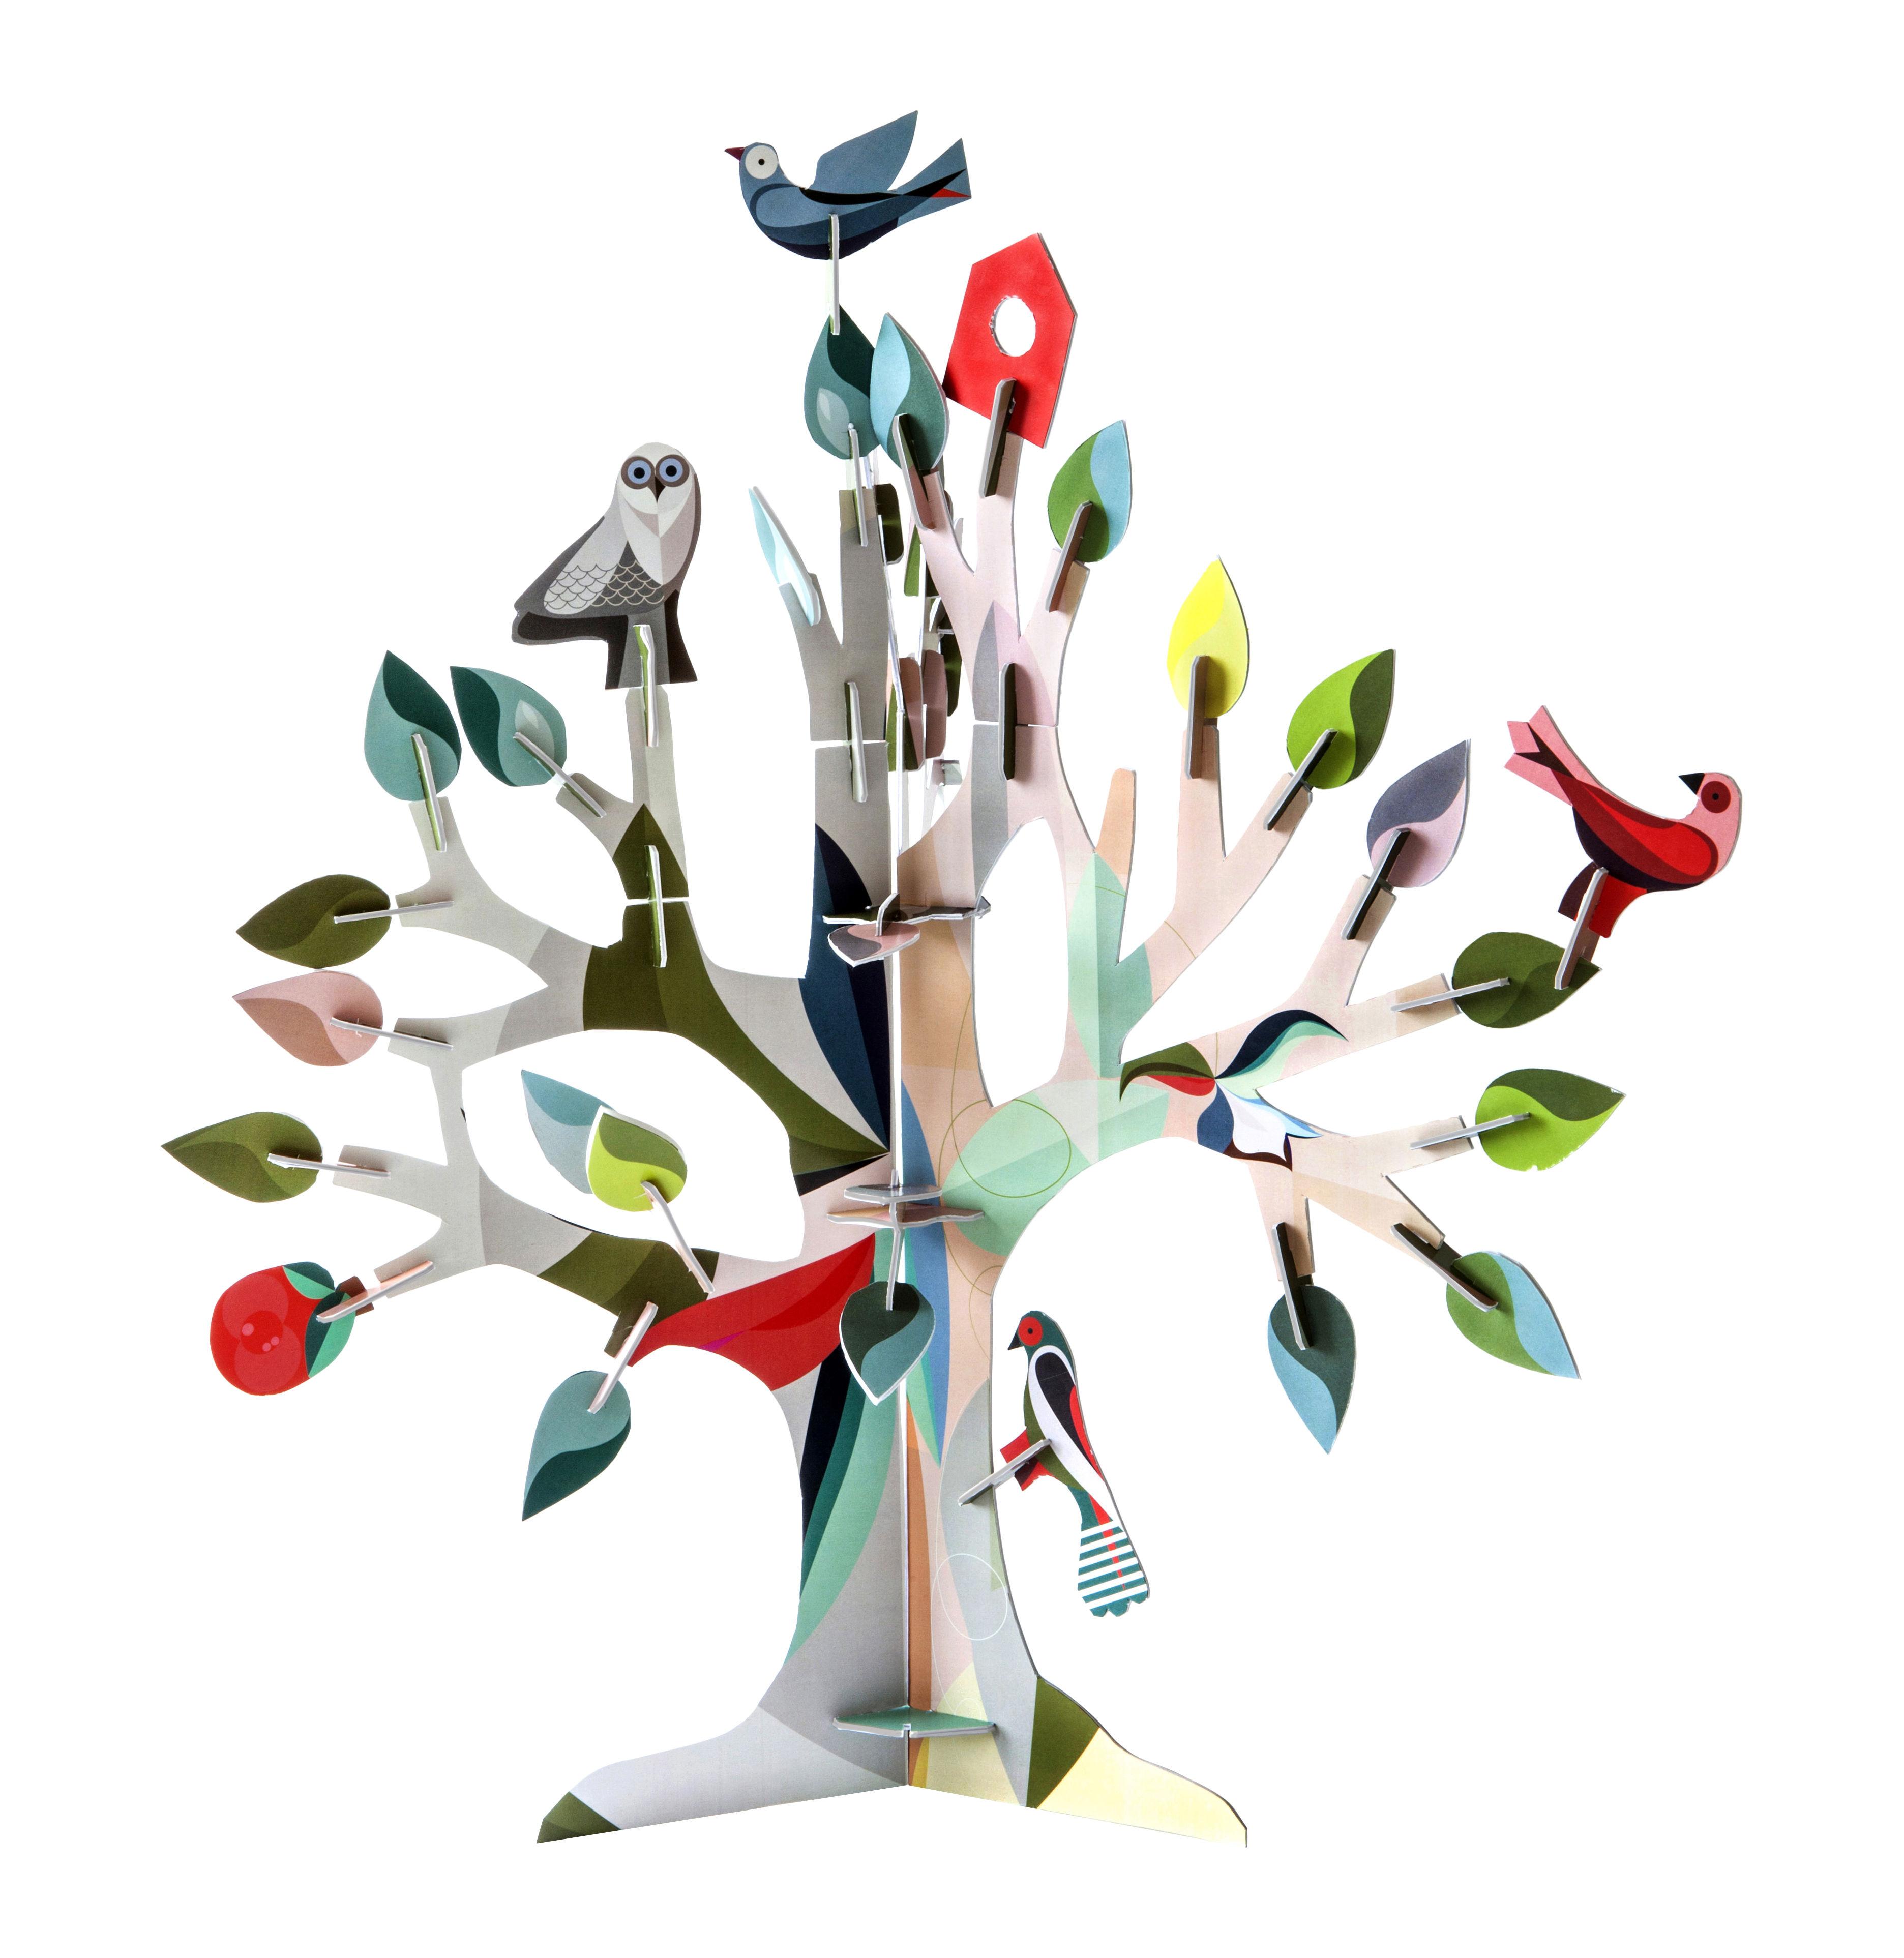 figurine construire totem arbre r ves carton arbre multicolore studio roof. Black Bedroom Furniture Sets. Home Design Ideas